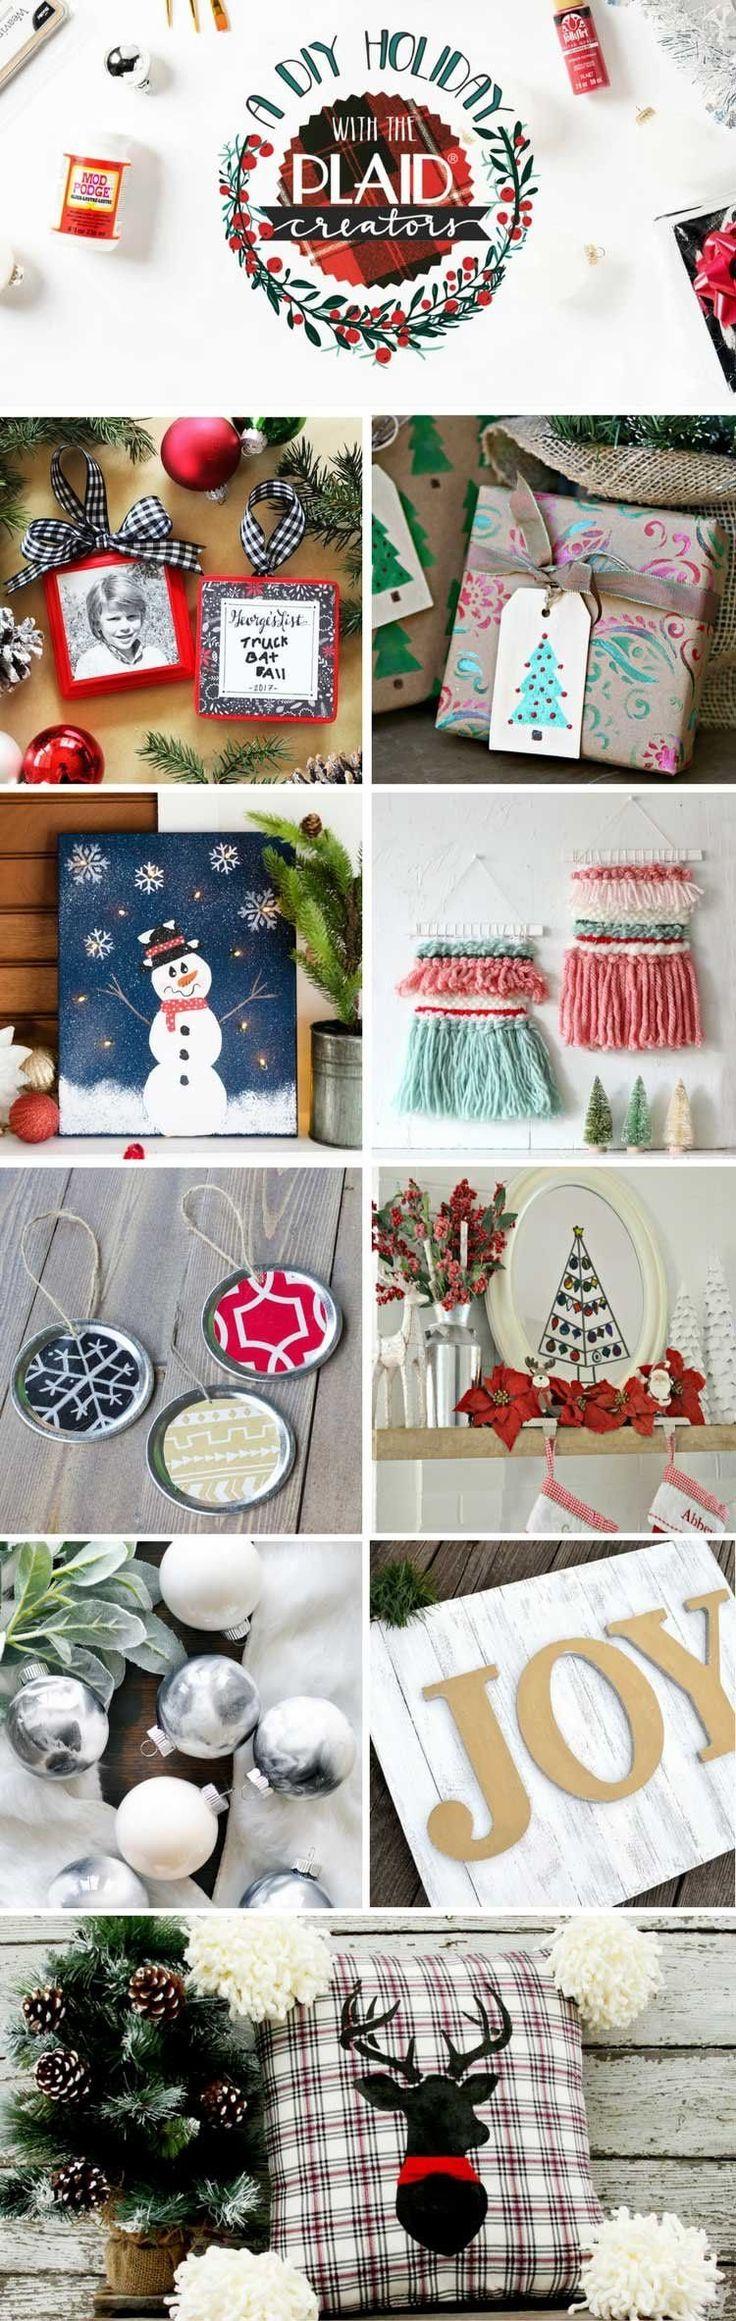 DIY Christmas u0026 holiday ideas including ornaments